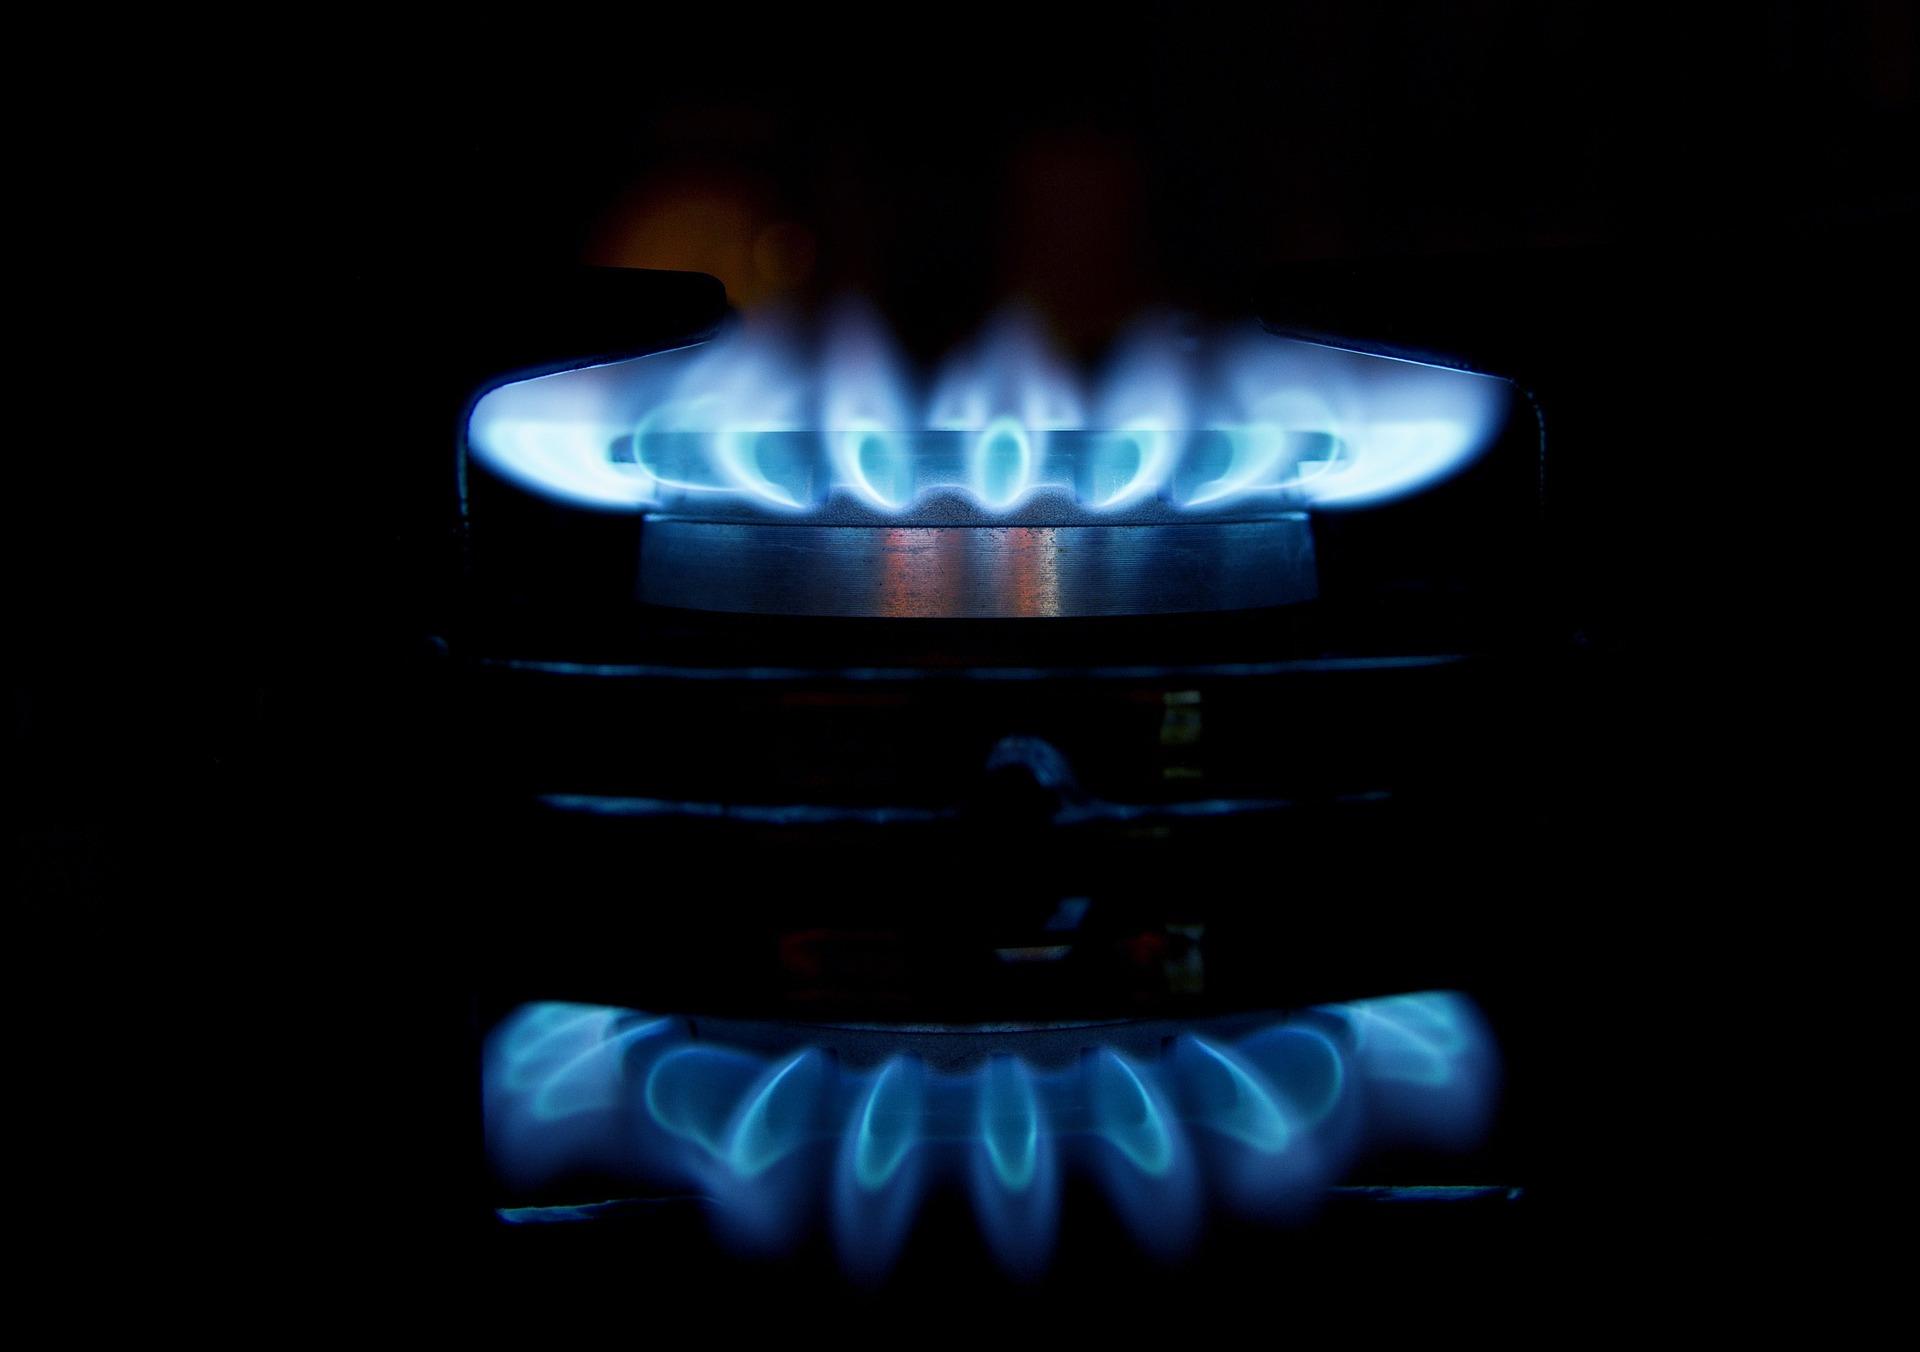 Poľśka gazova kompanija PGNiG zberigatyme blakytne palyvo v Ukraїni